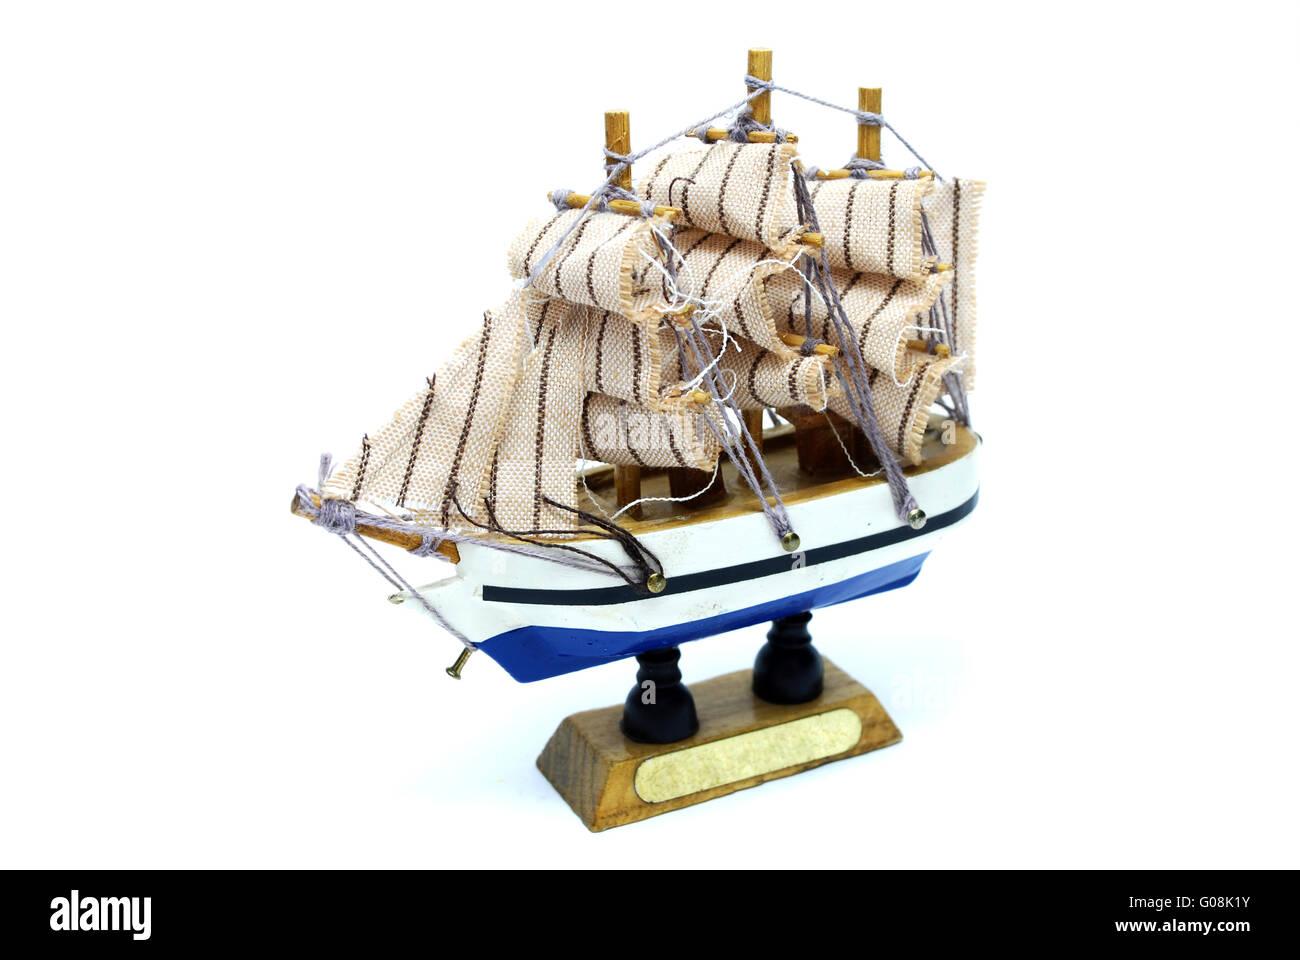 Frigate Ship Model - Stock Image